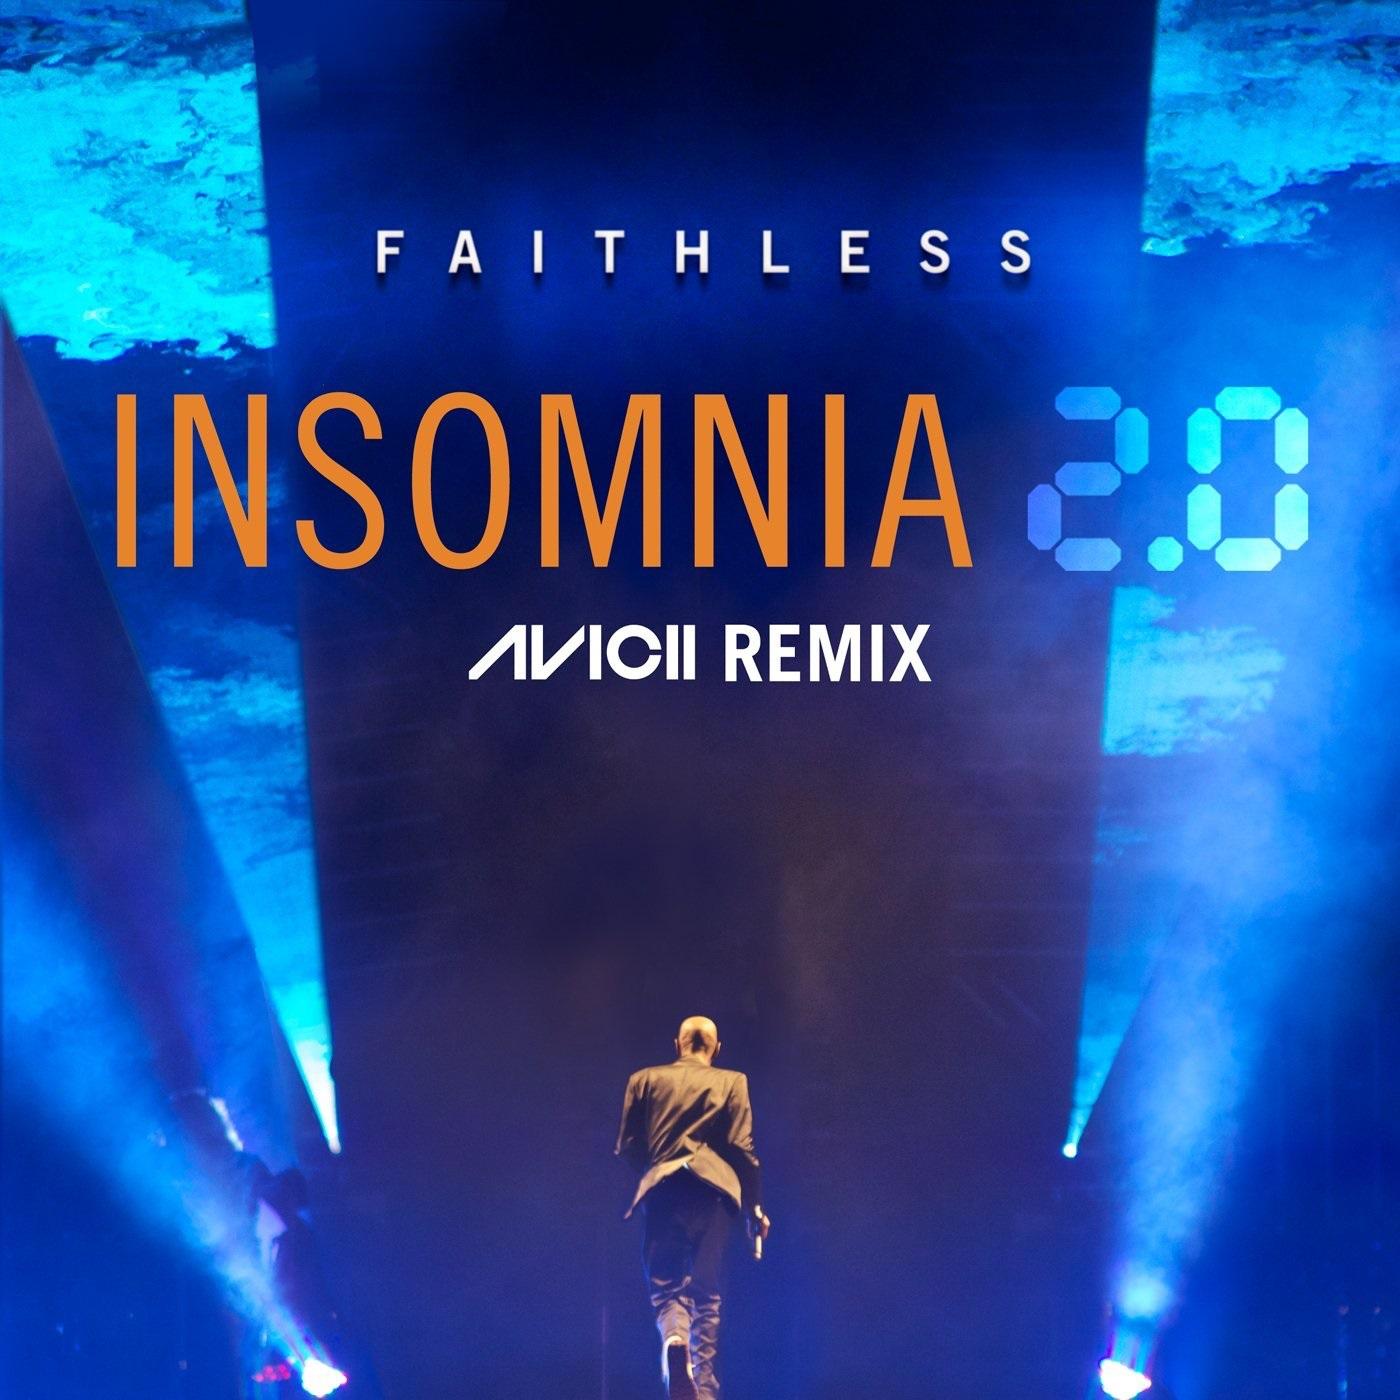 Faithless - Insomnia 2.0 (Avicii Remix)